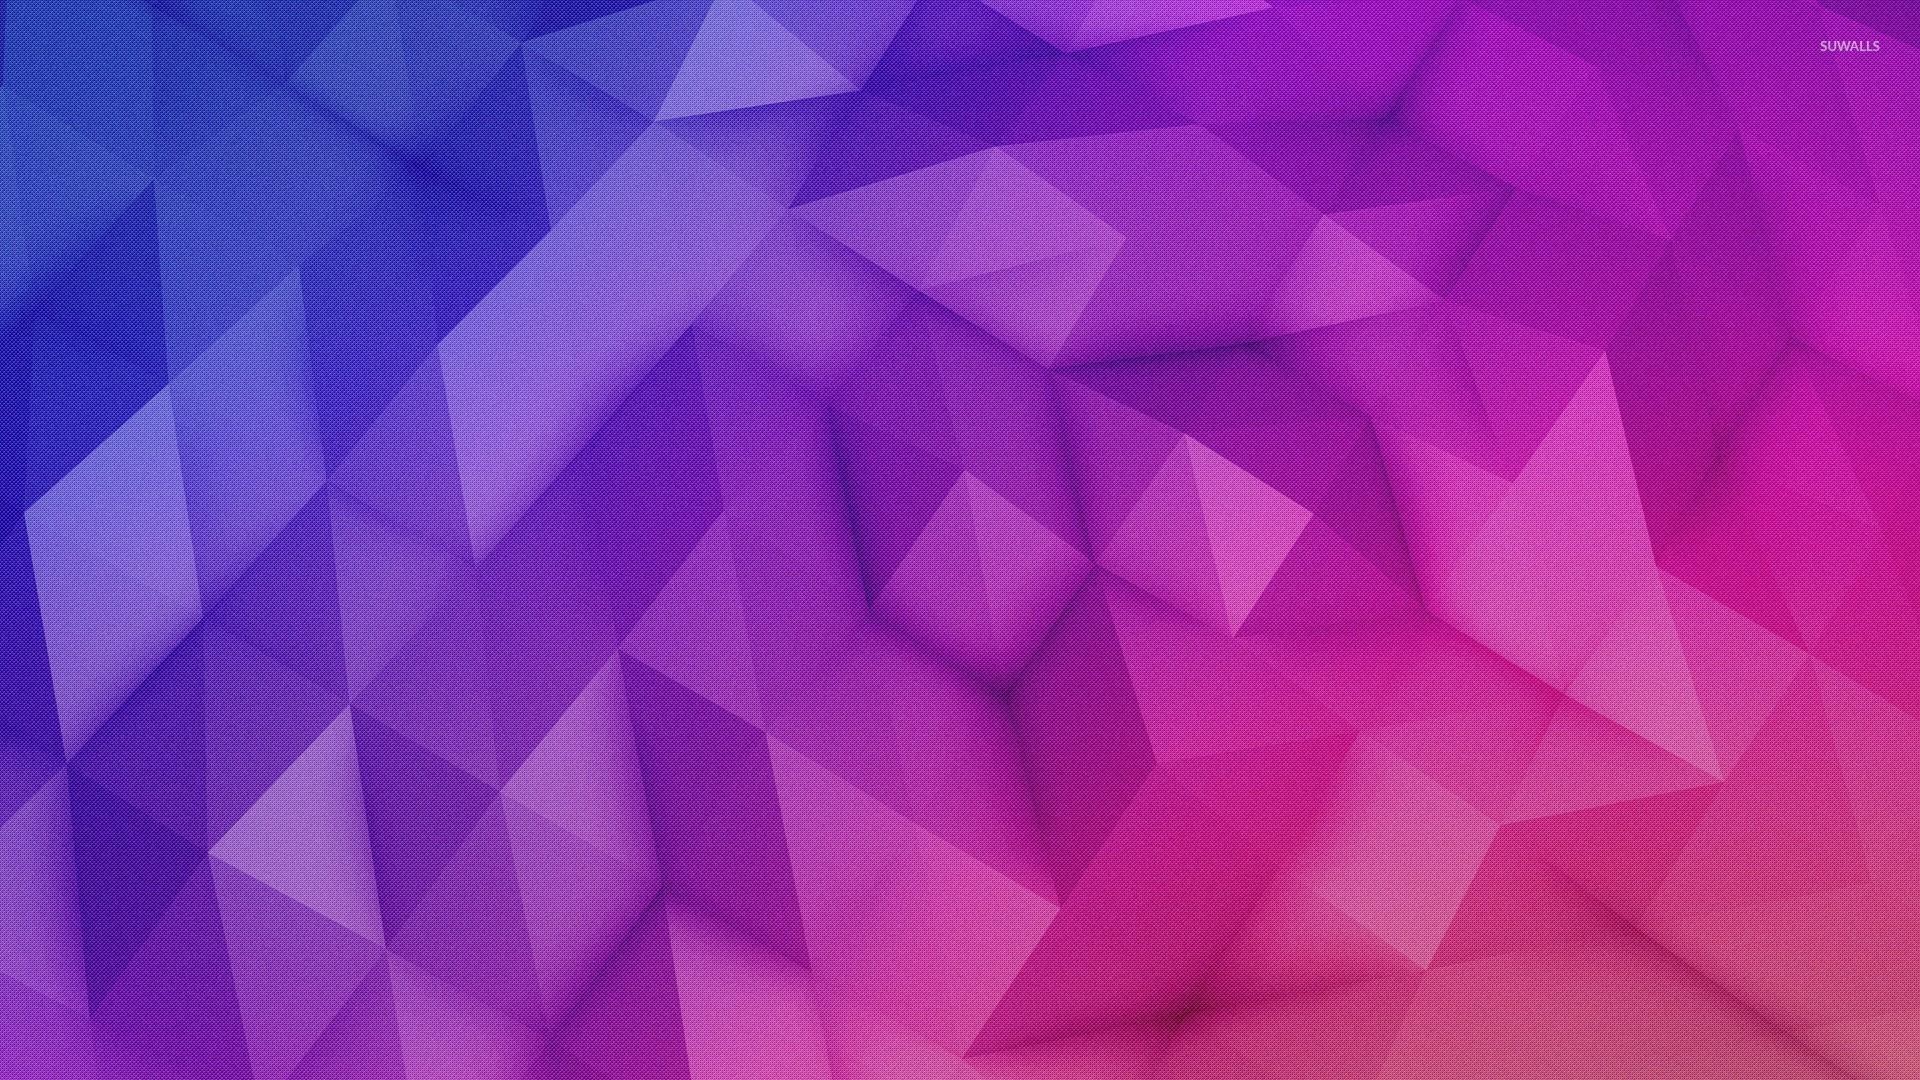 orange and pink triangles wallpaper digital art wallpapers 53680